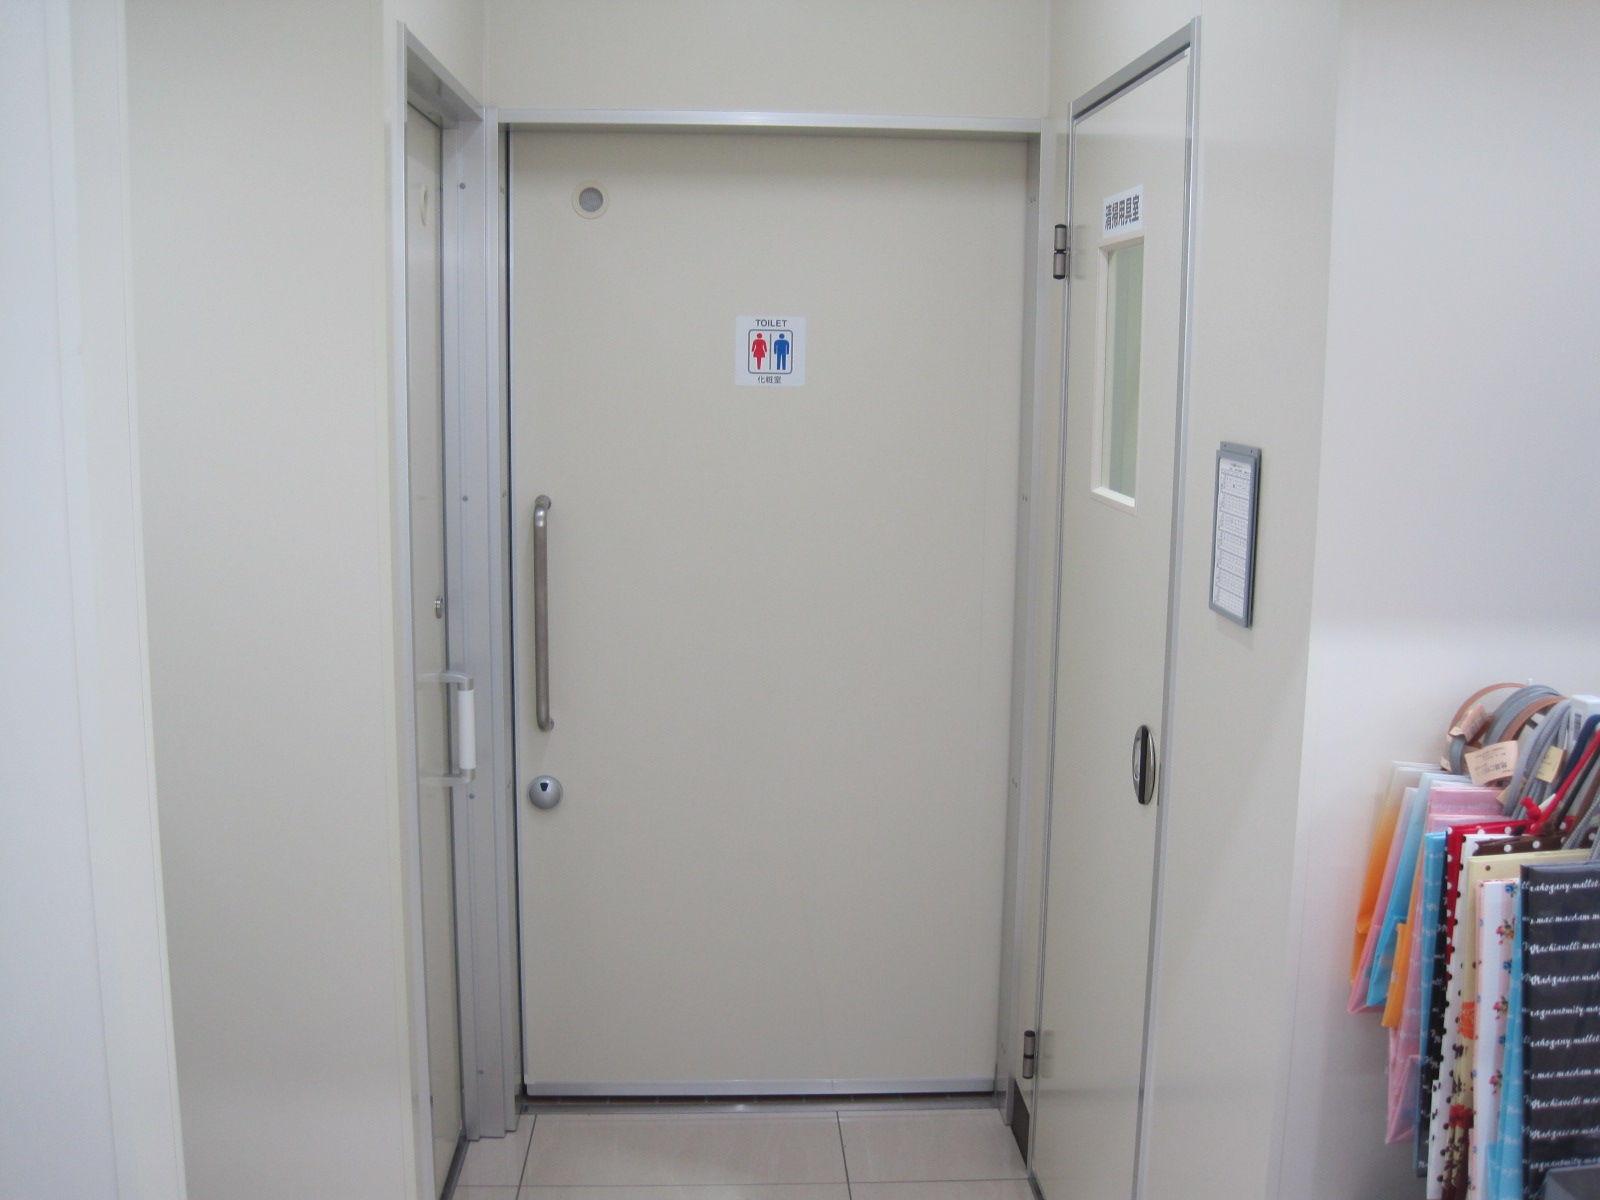 トイレ設備調査日記atosatu                  atosatu